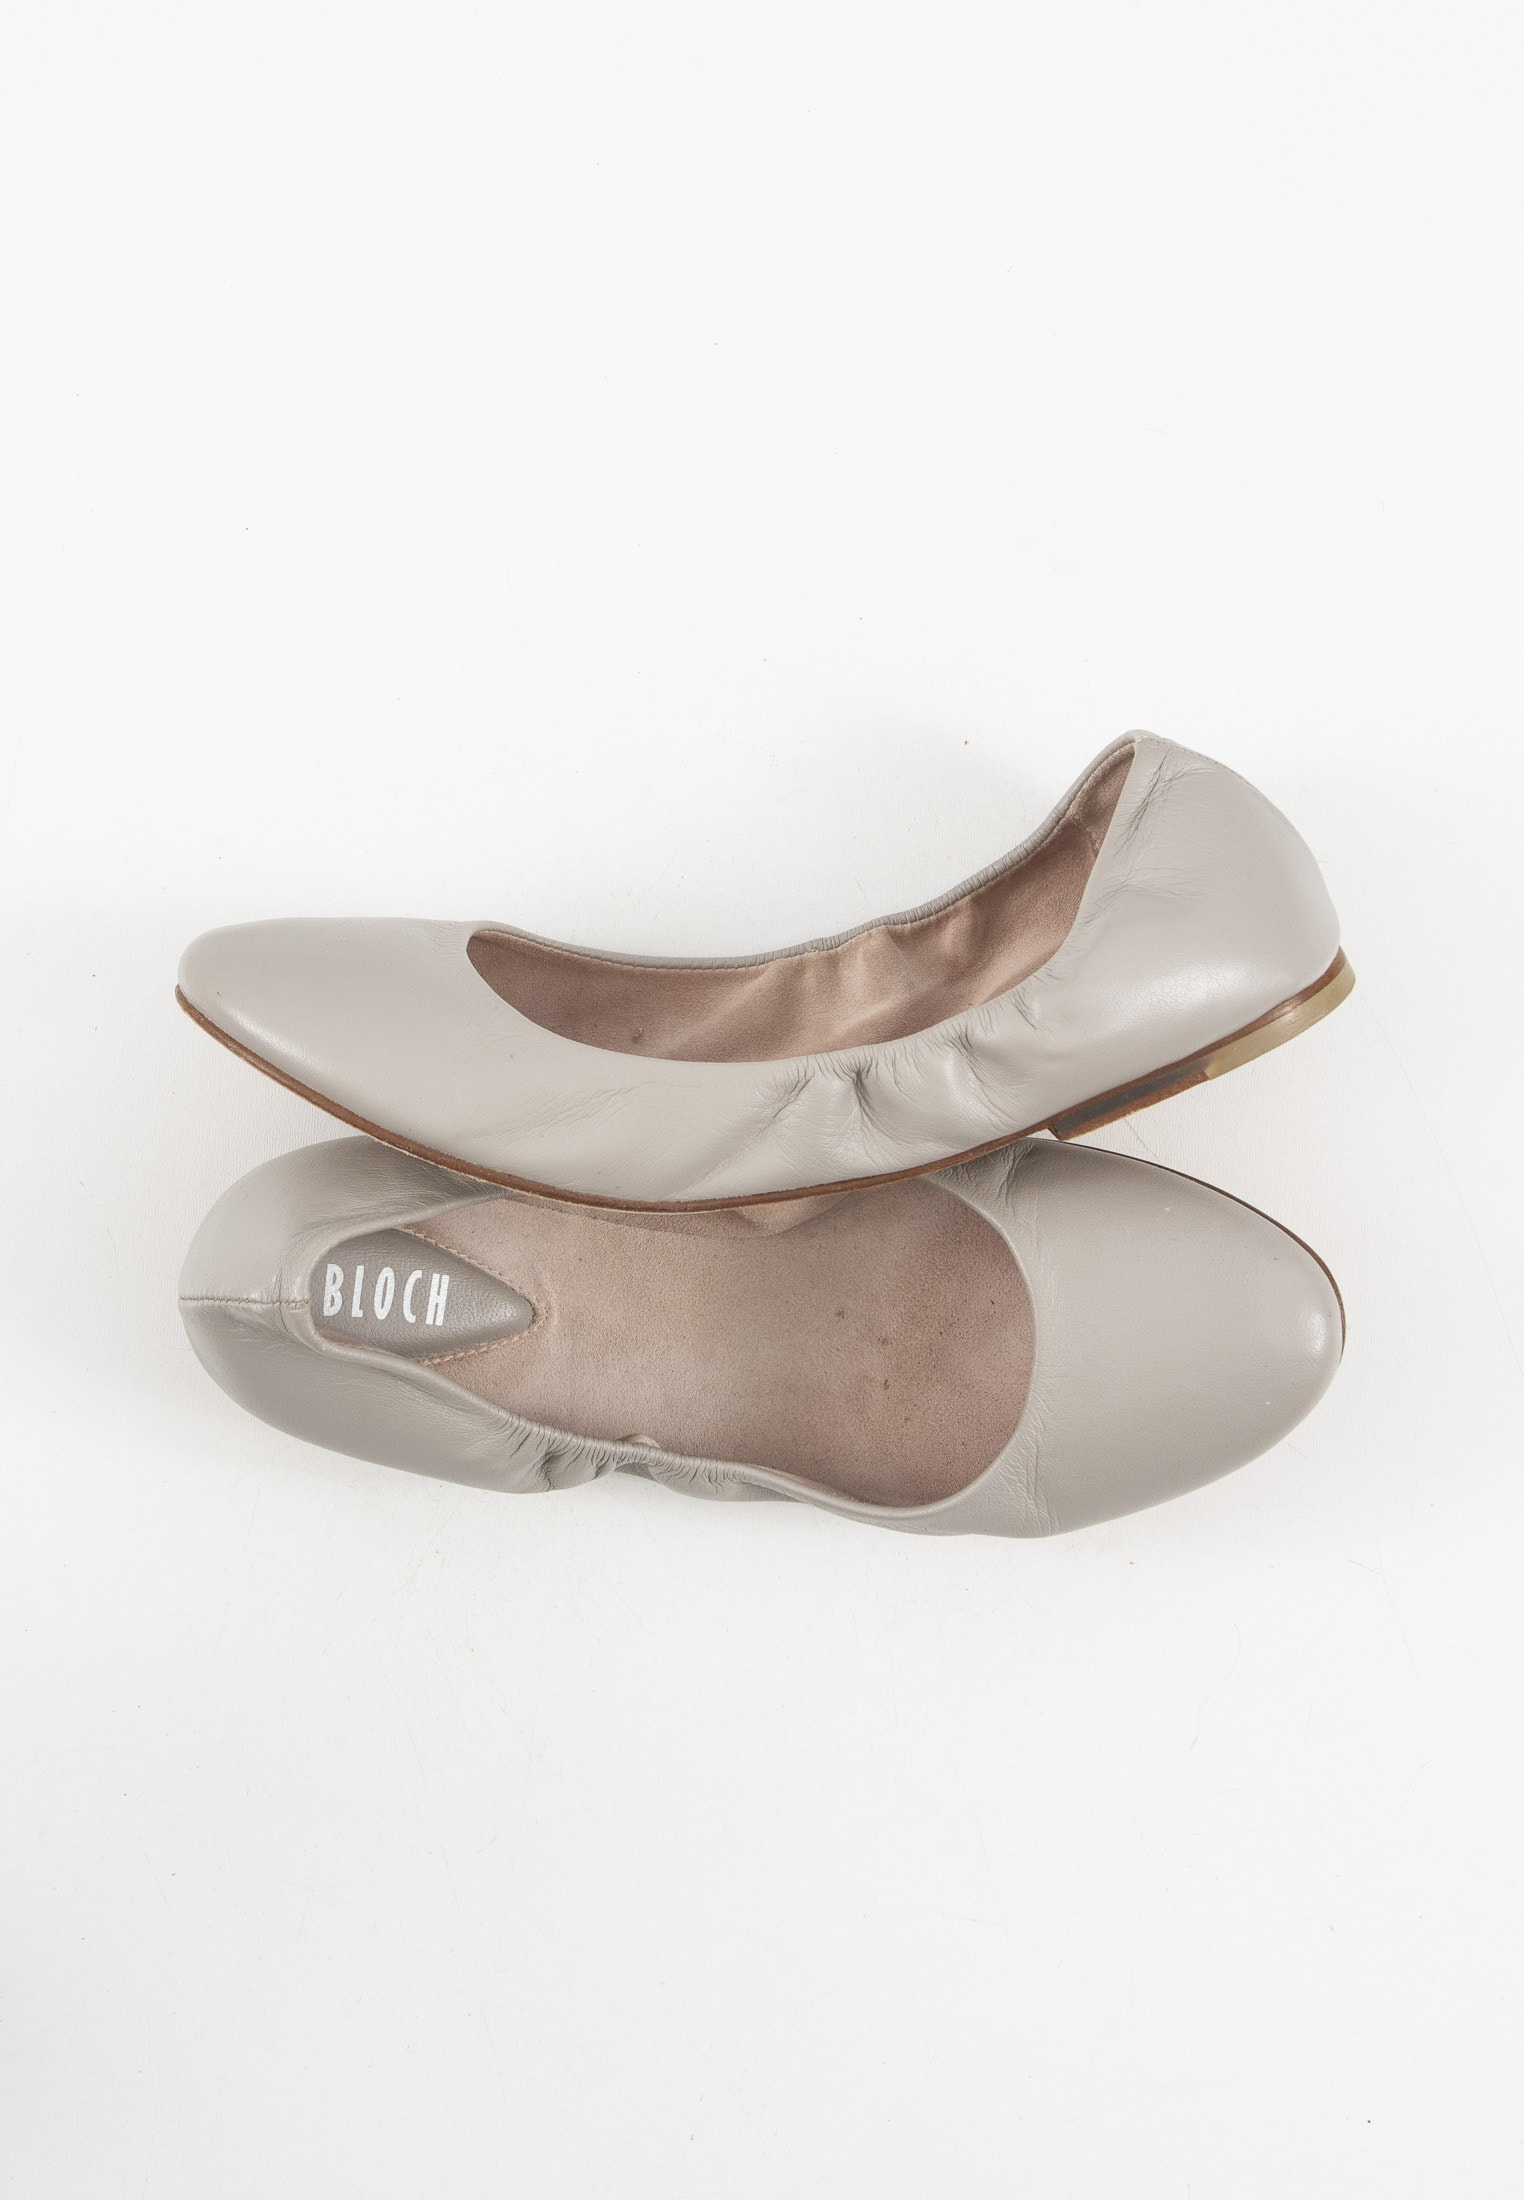 Bloch Halbschuh / Ballerina Grau Gr.39